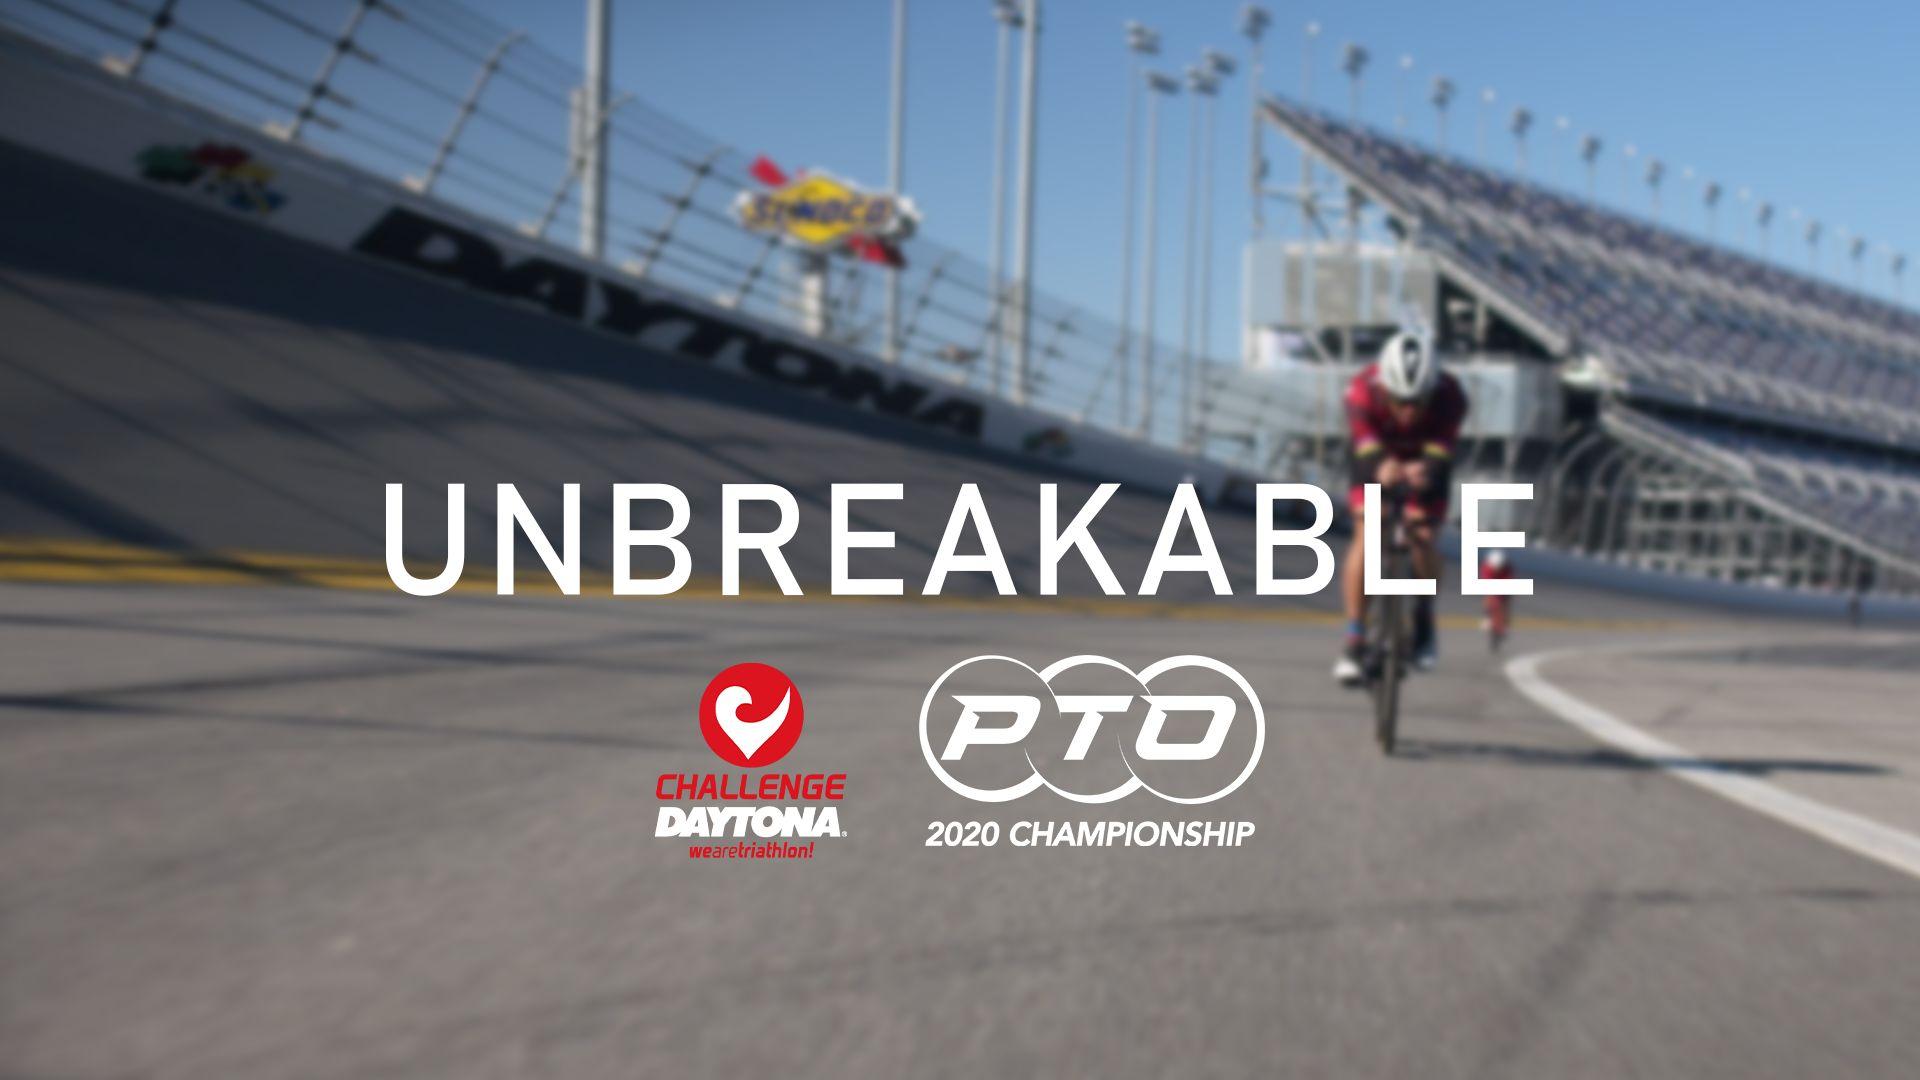 Unbreakable || PTO 2020 Championship